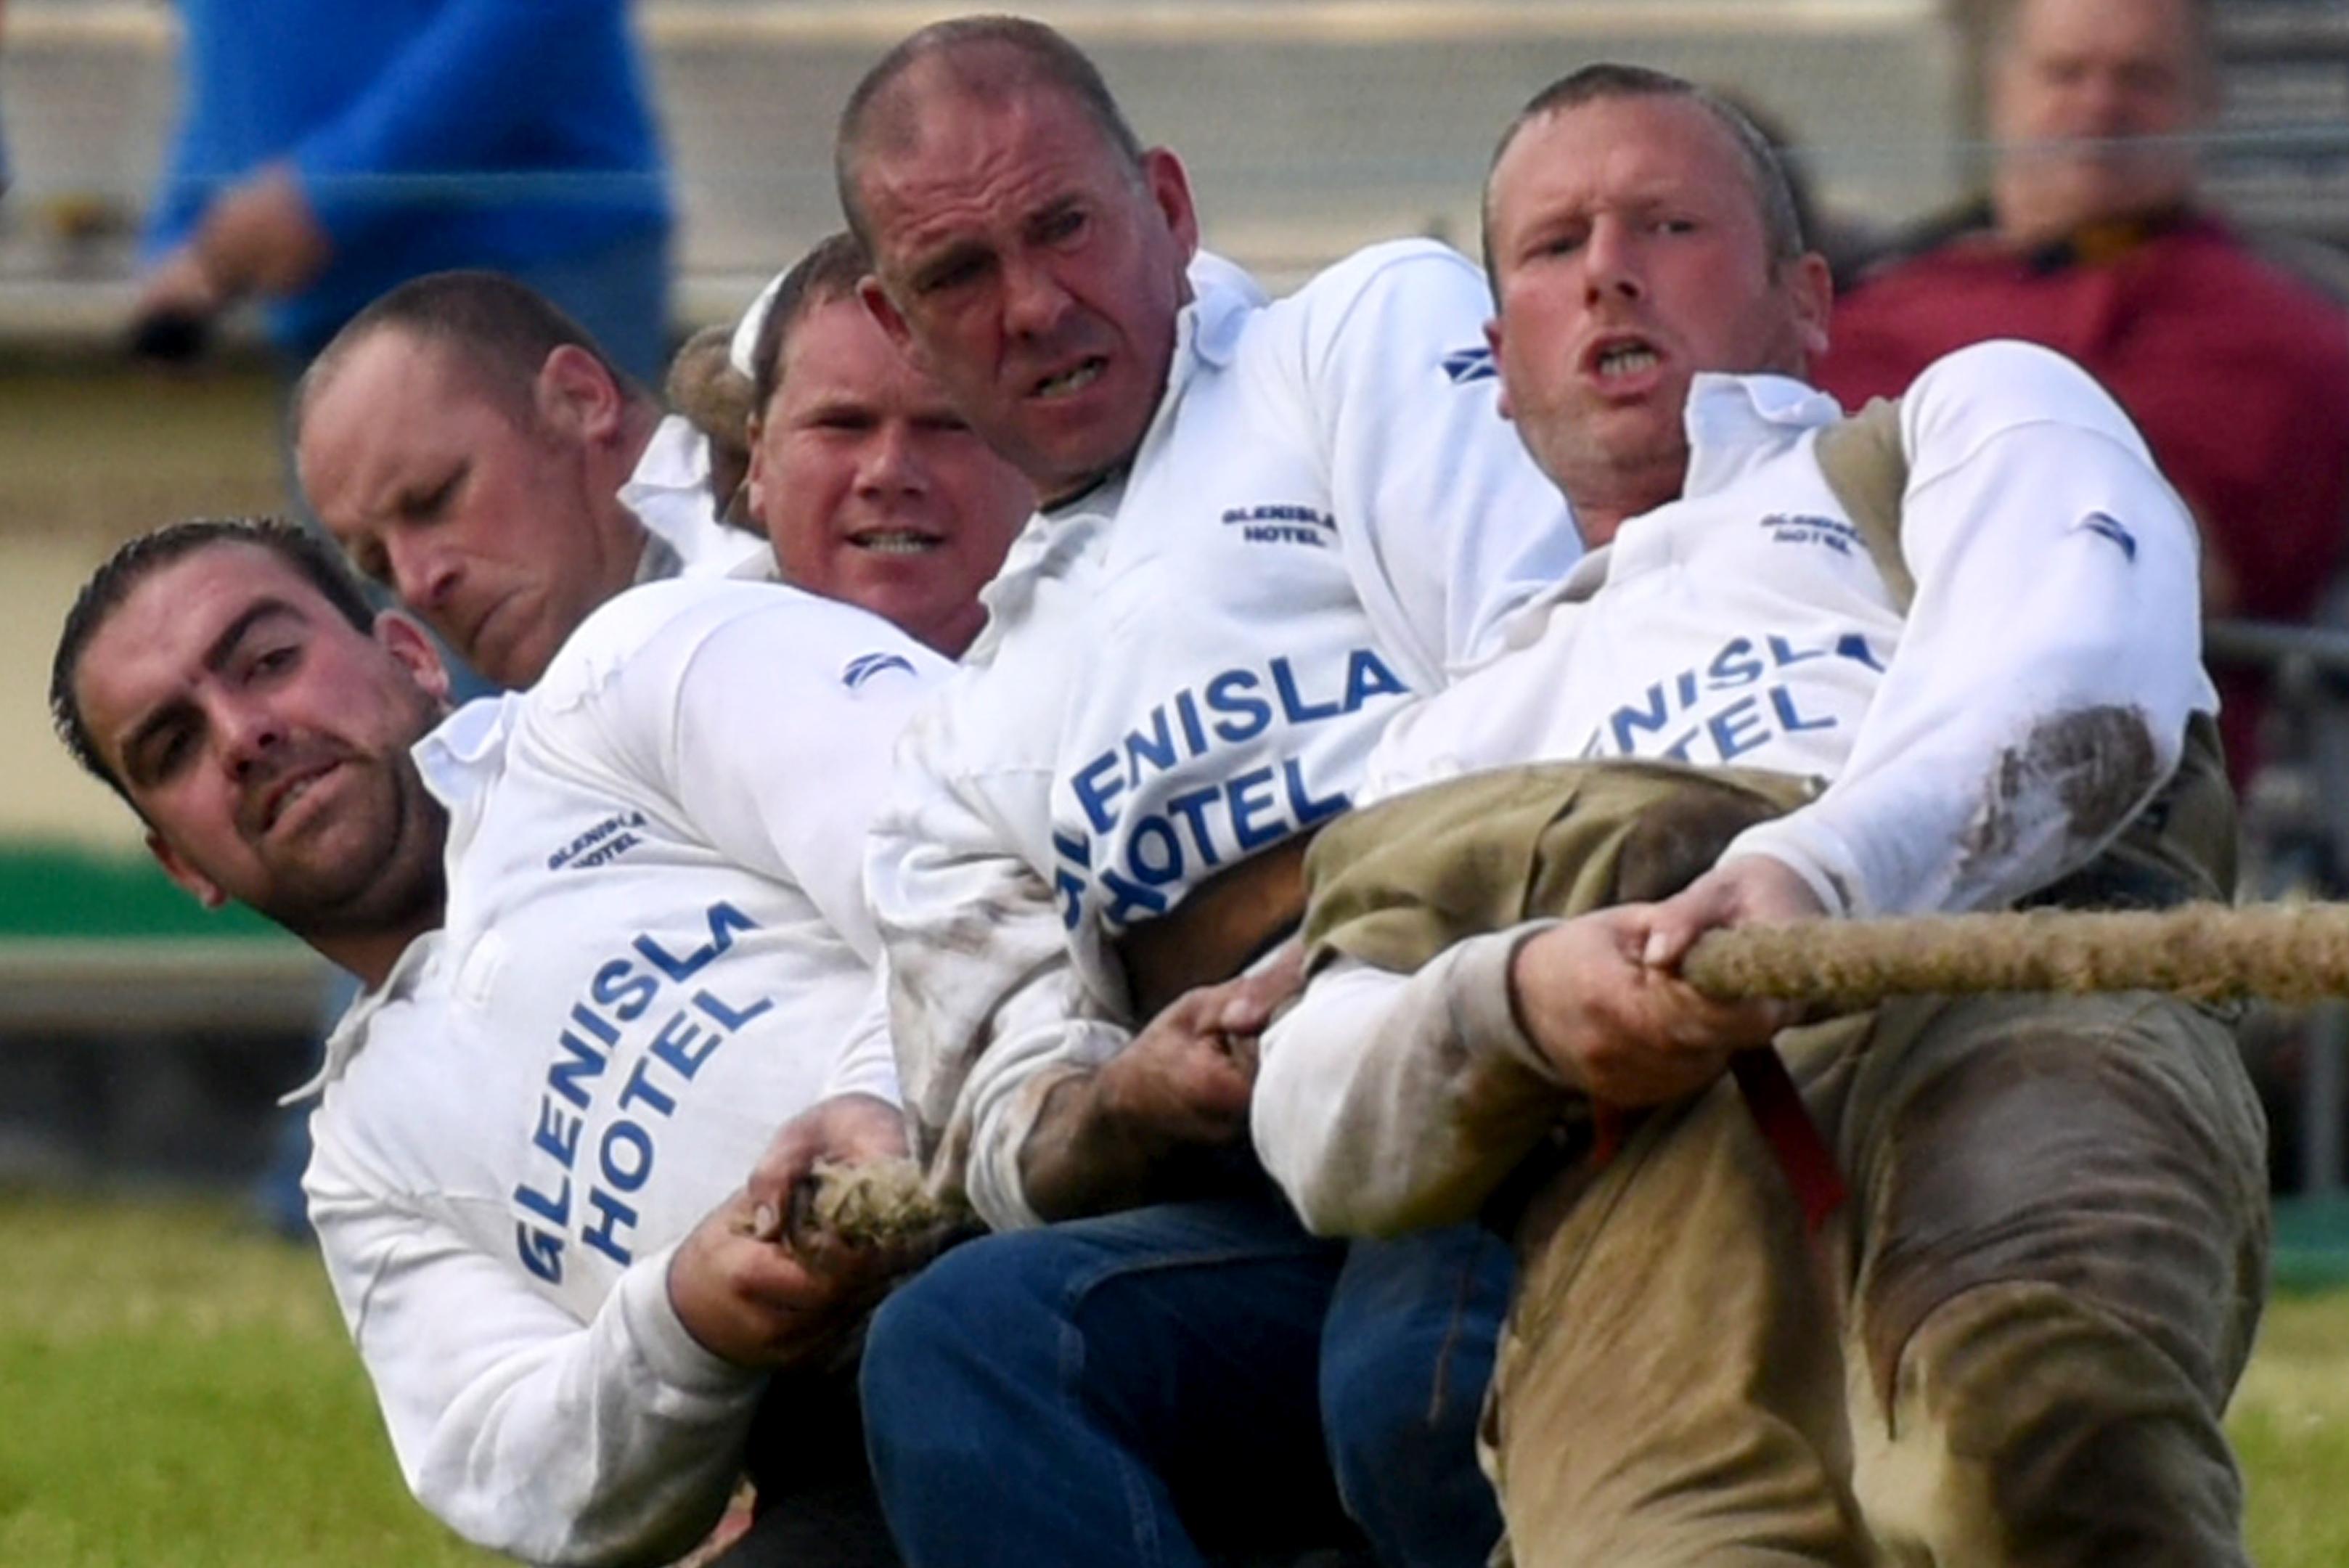 The Glenisla Hotel tug-o-war team in action.